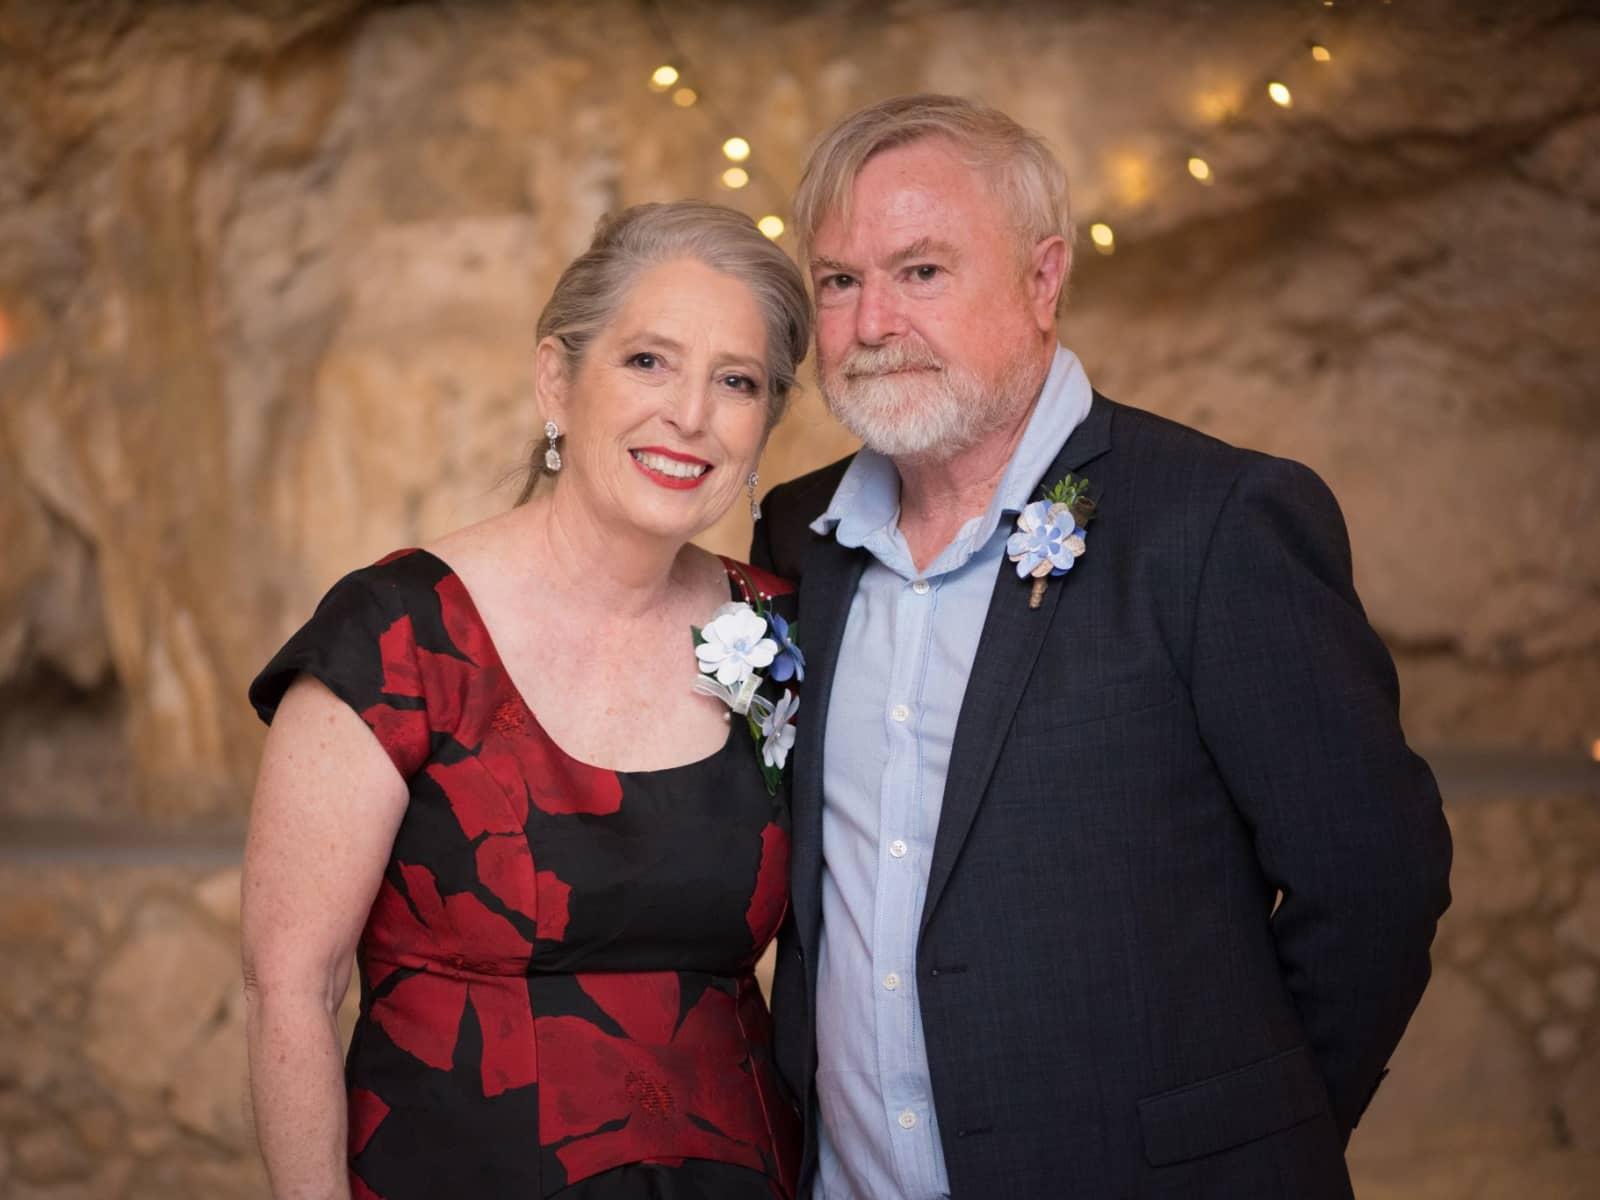 Carol & George from Perth, Western Australia, Australia